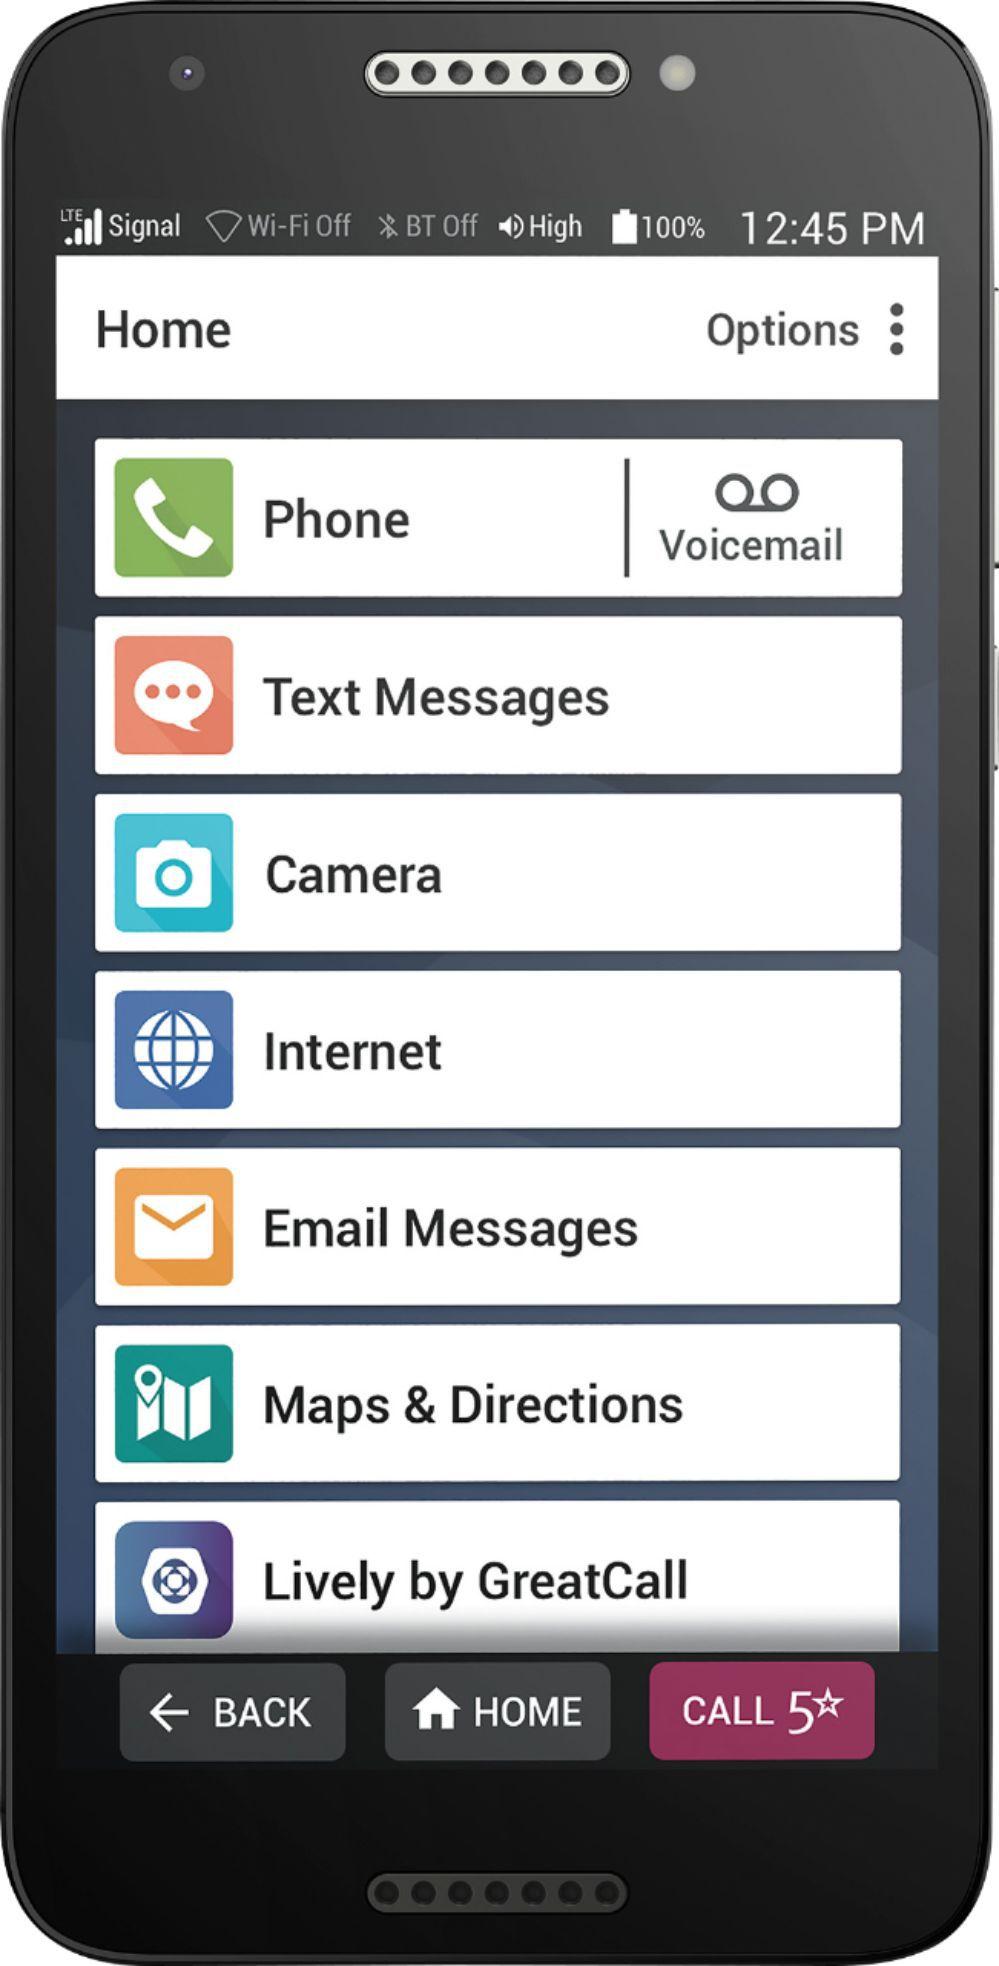 GreatCall - GreatCall Jitterbug Smart2 Prepaid Smartphone for Seniors - Black